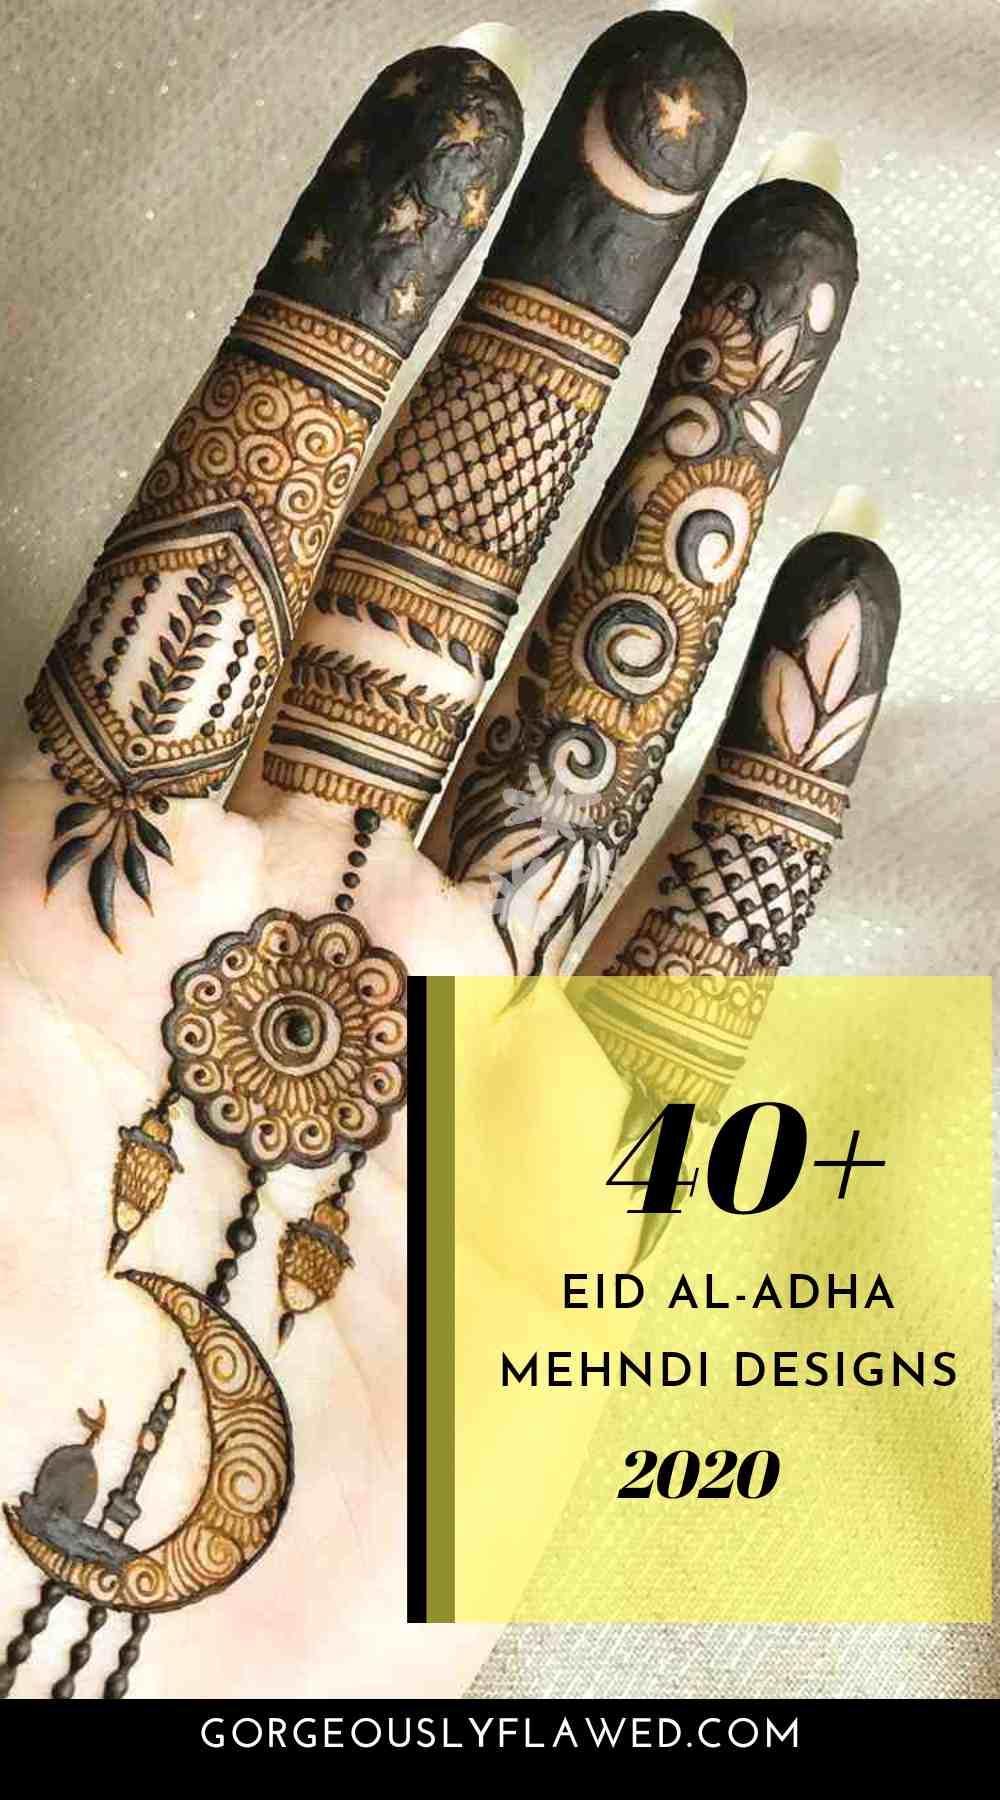 40+ Eid Al-Adha Mehndi Designs 2020 | Best Mehndi Design Images For Eid Ul-Adha 2020